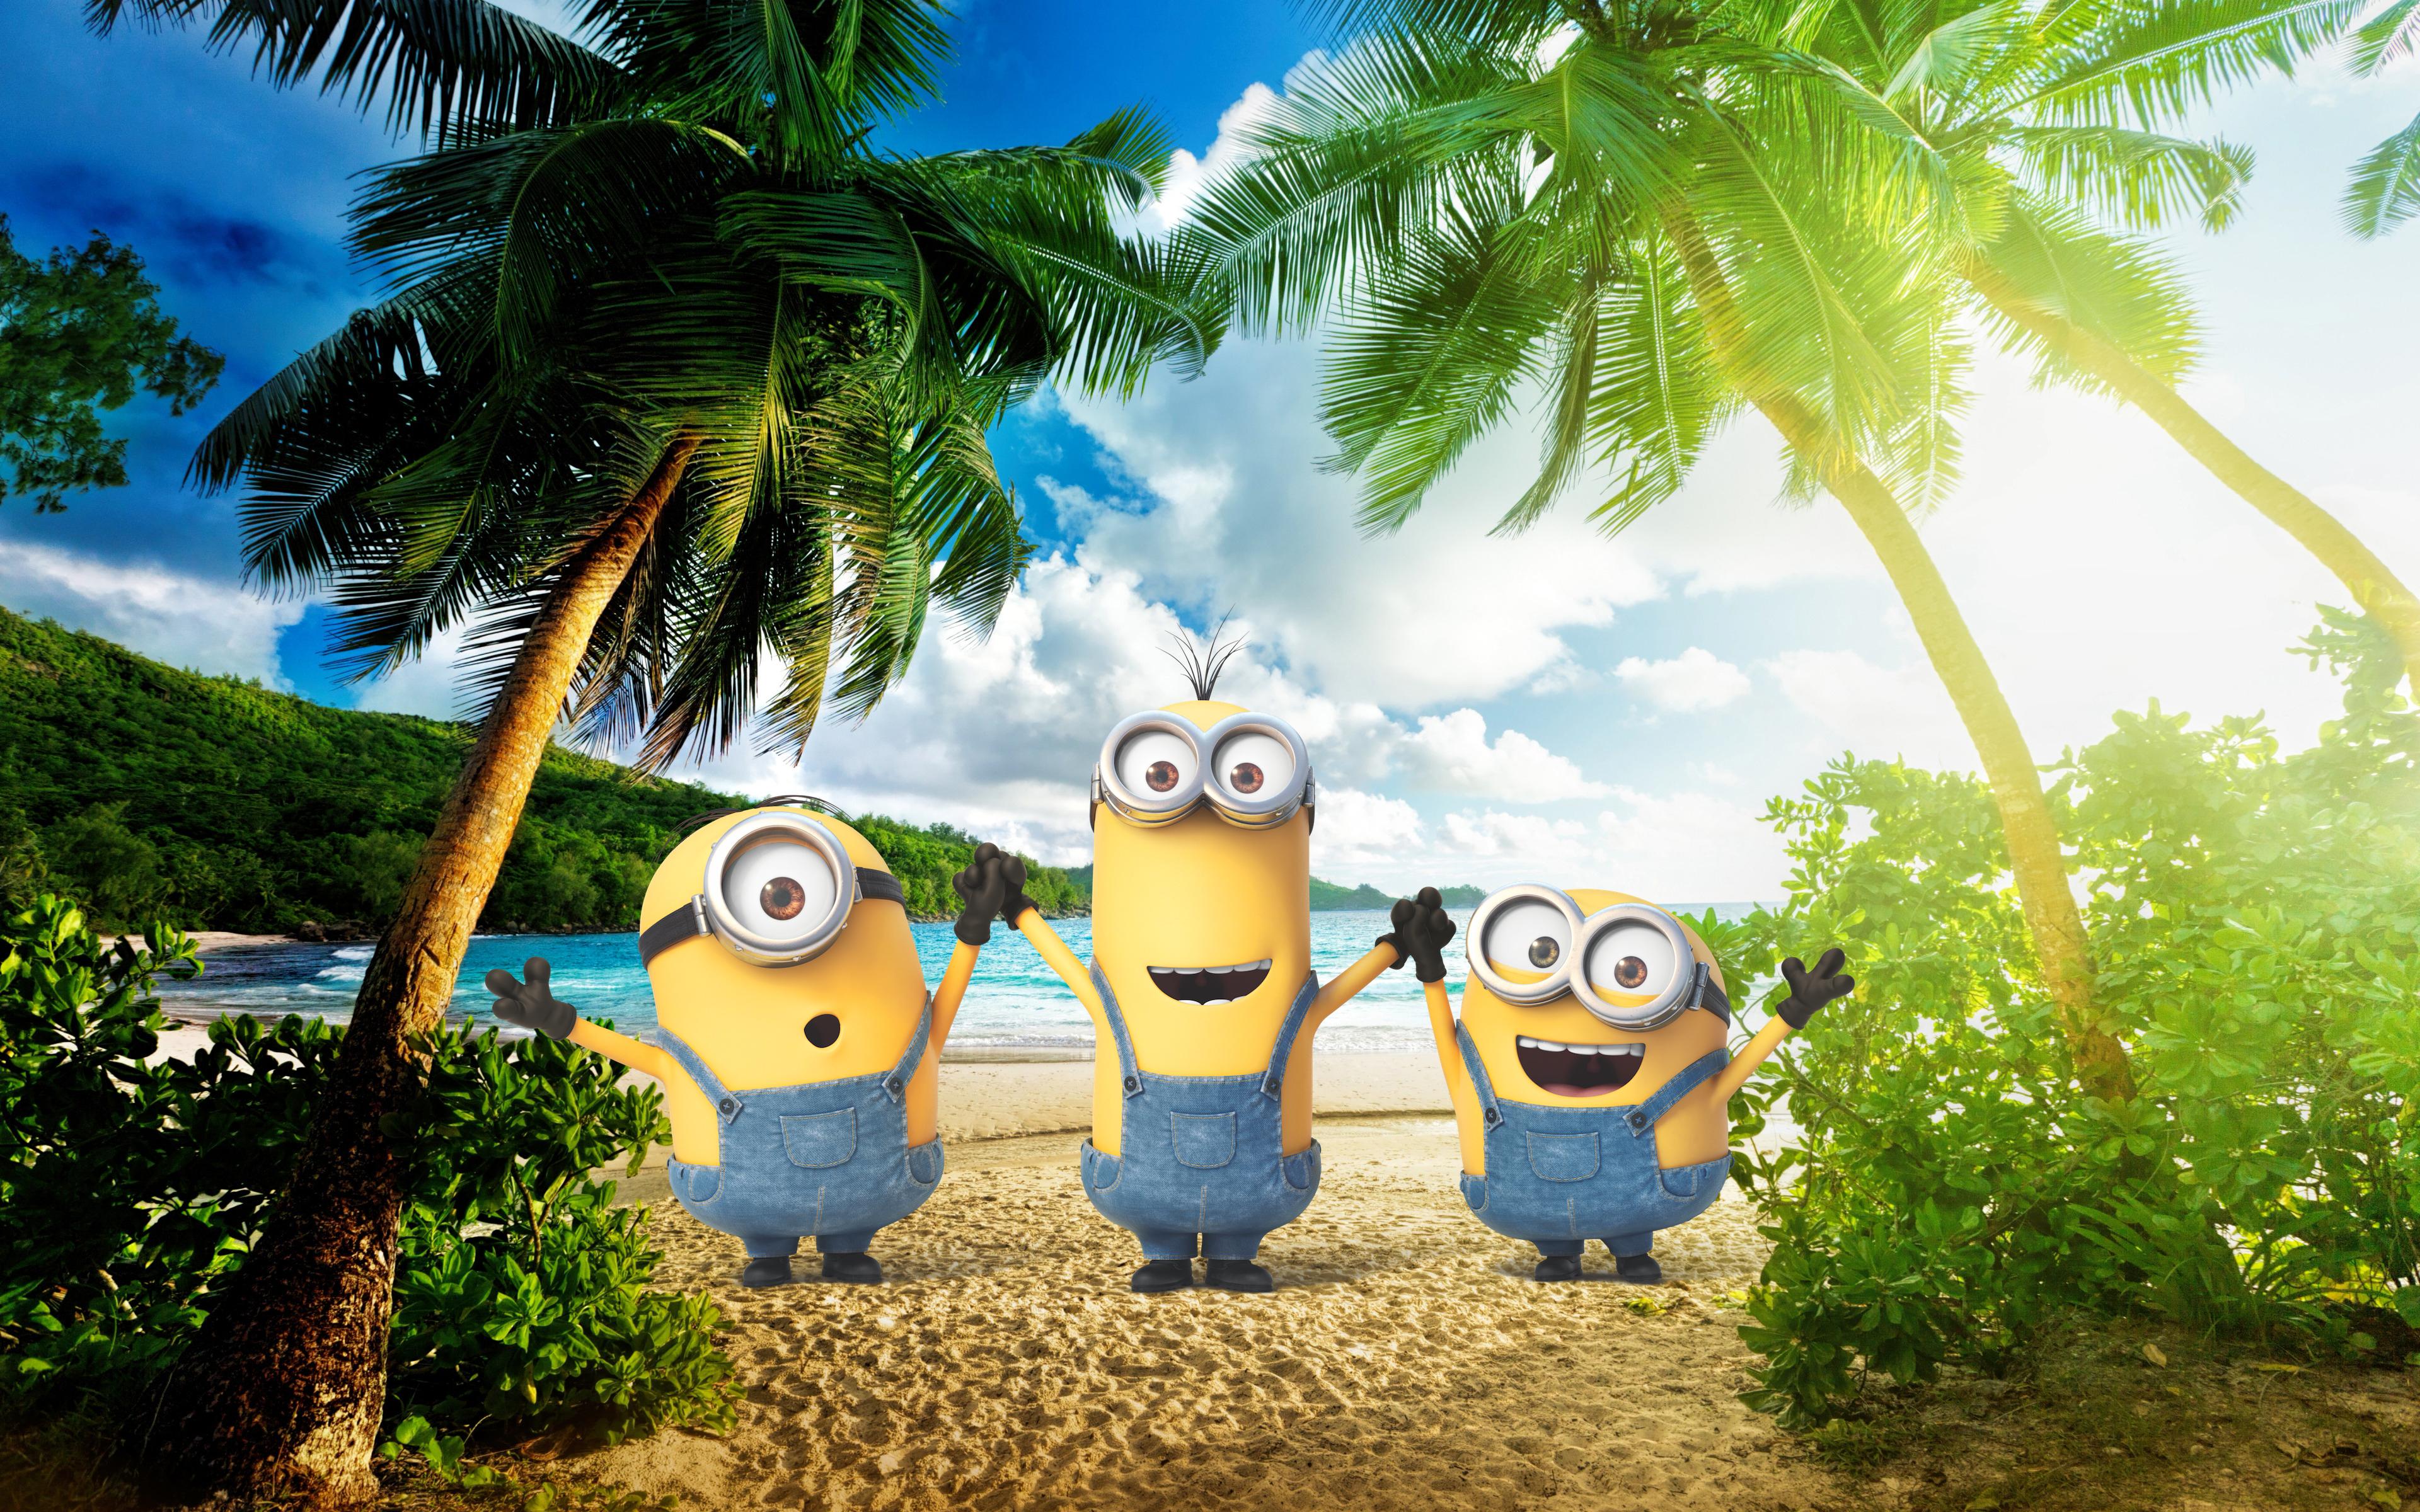 Minions, 4k, Palms, Exotic Beach, Kevin, Stuart, Bob, - Palm Beach - HD Wallpaper